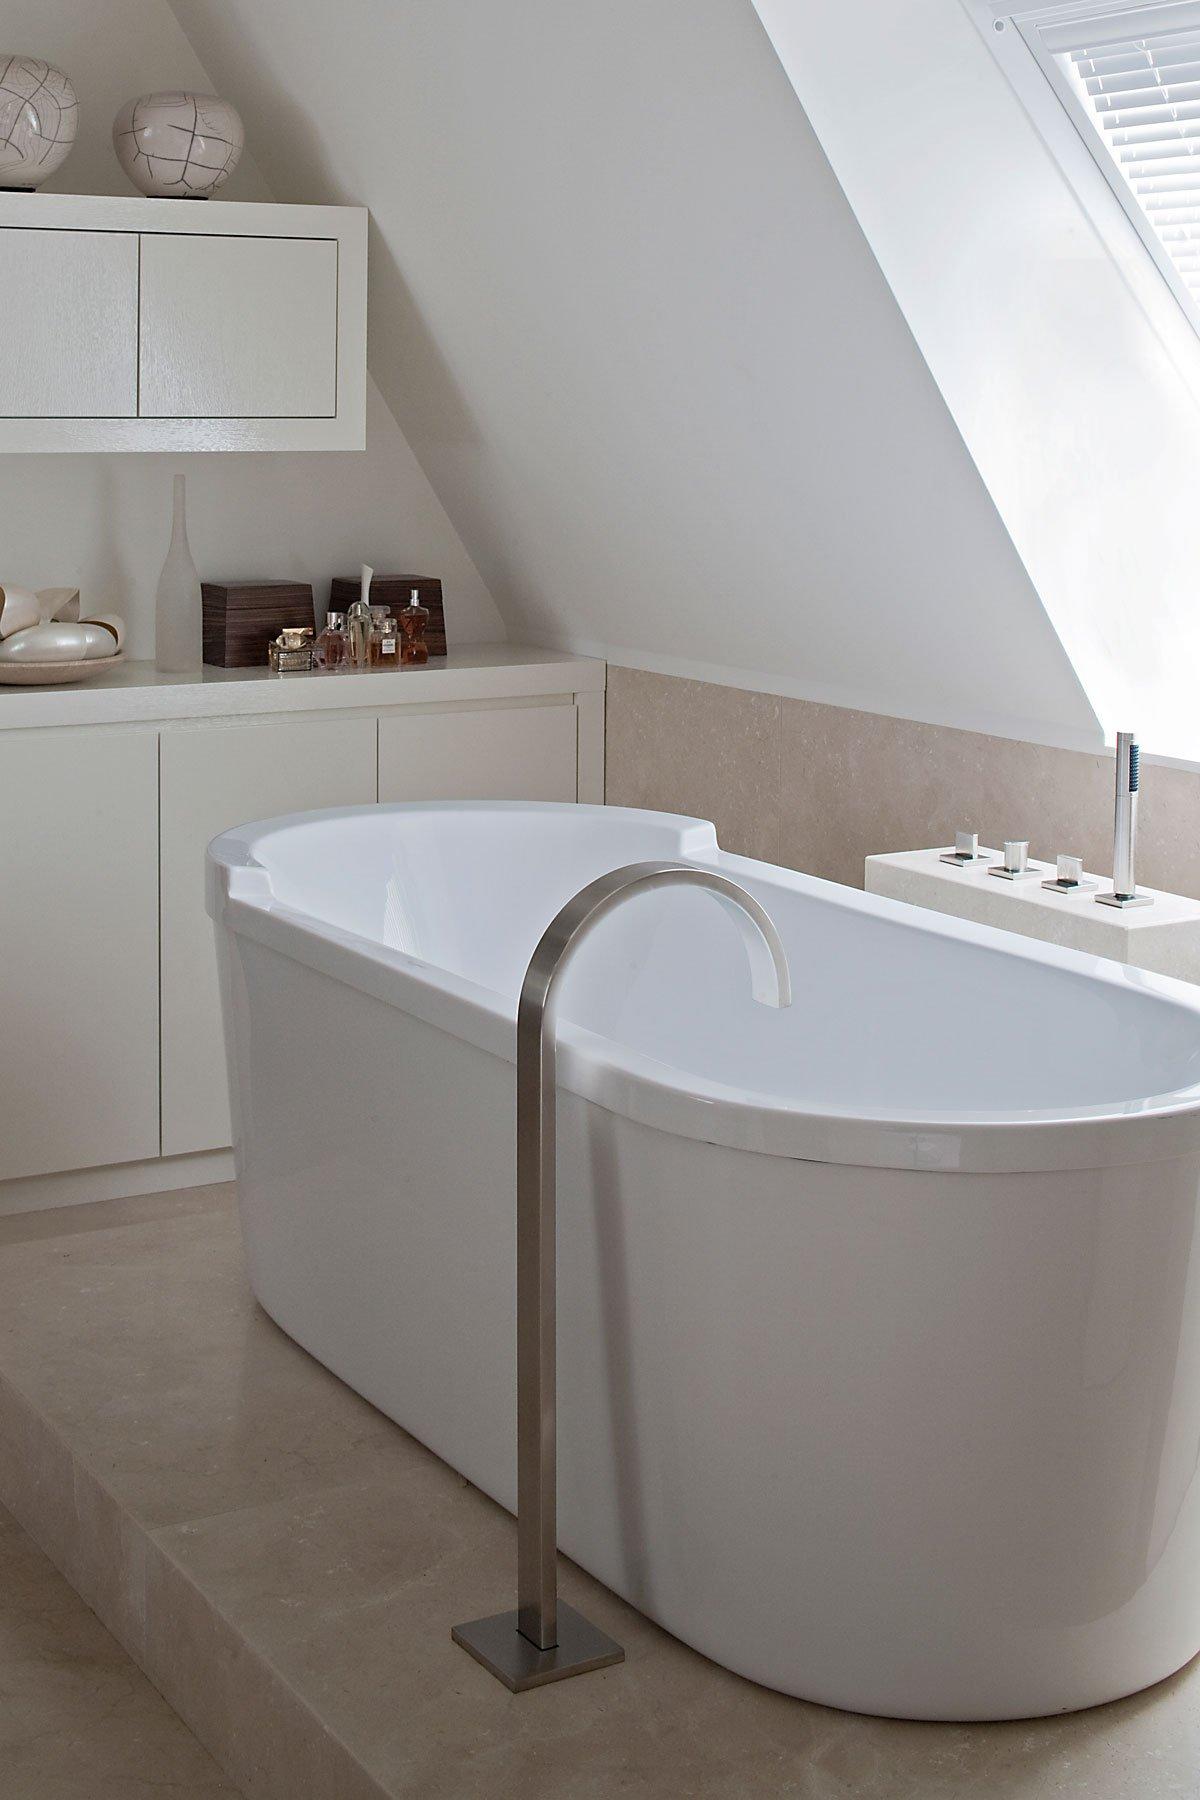 Badkamer, sanitair, vrijstaand bad, bad, kraan, riante villa, Leeflang Architectuur